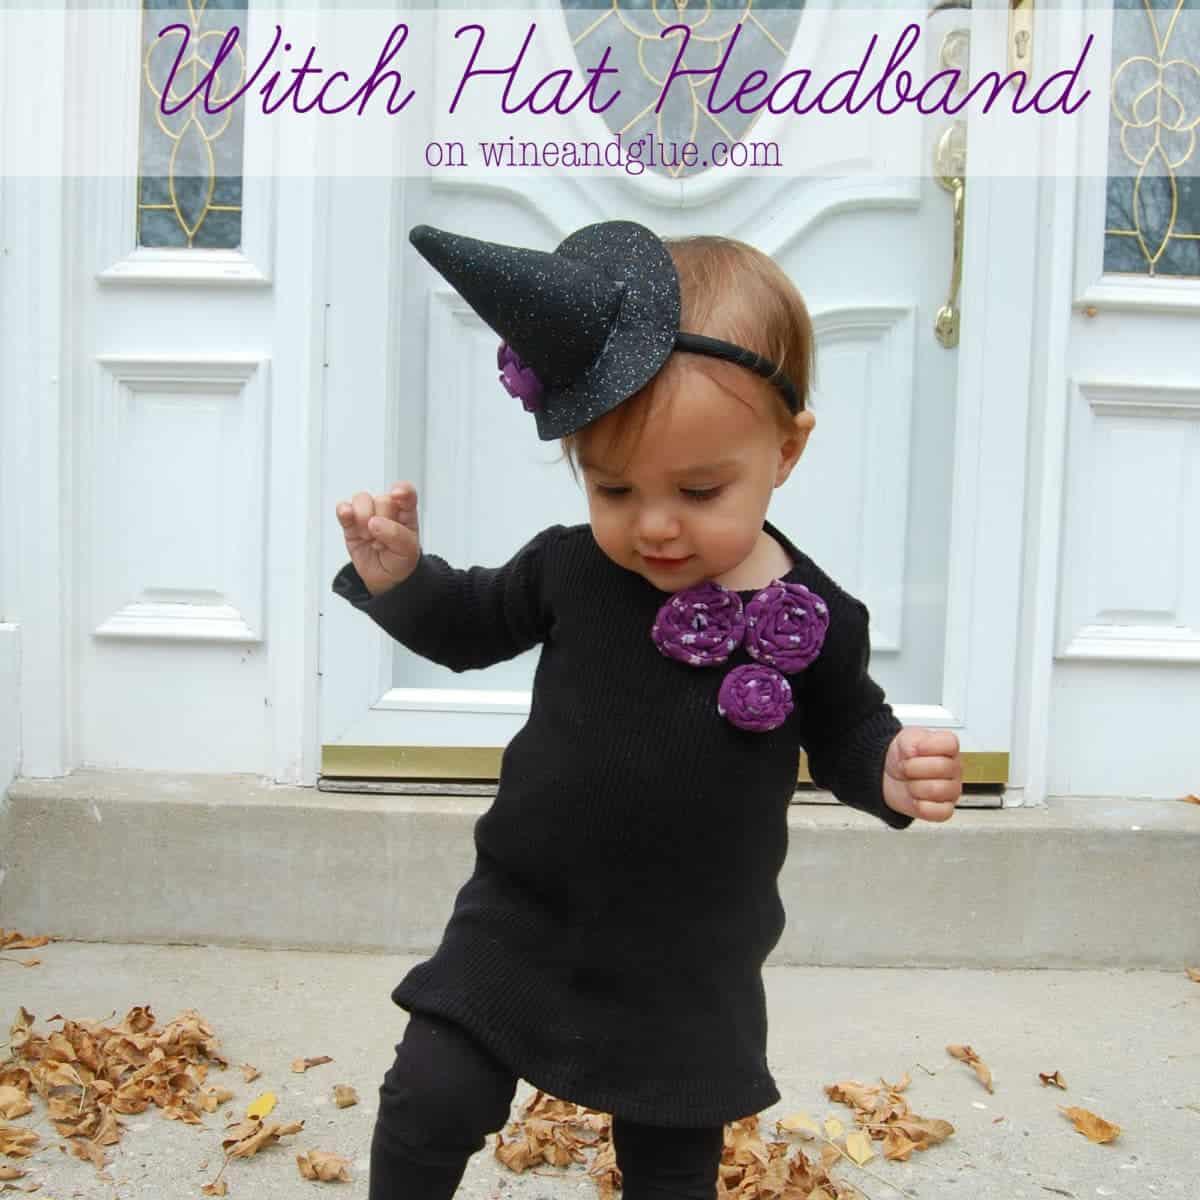 witch_hat_headband